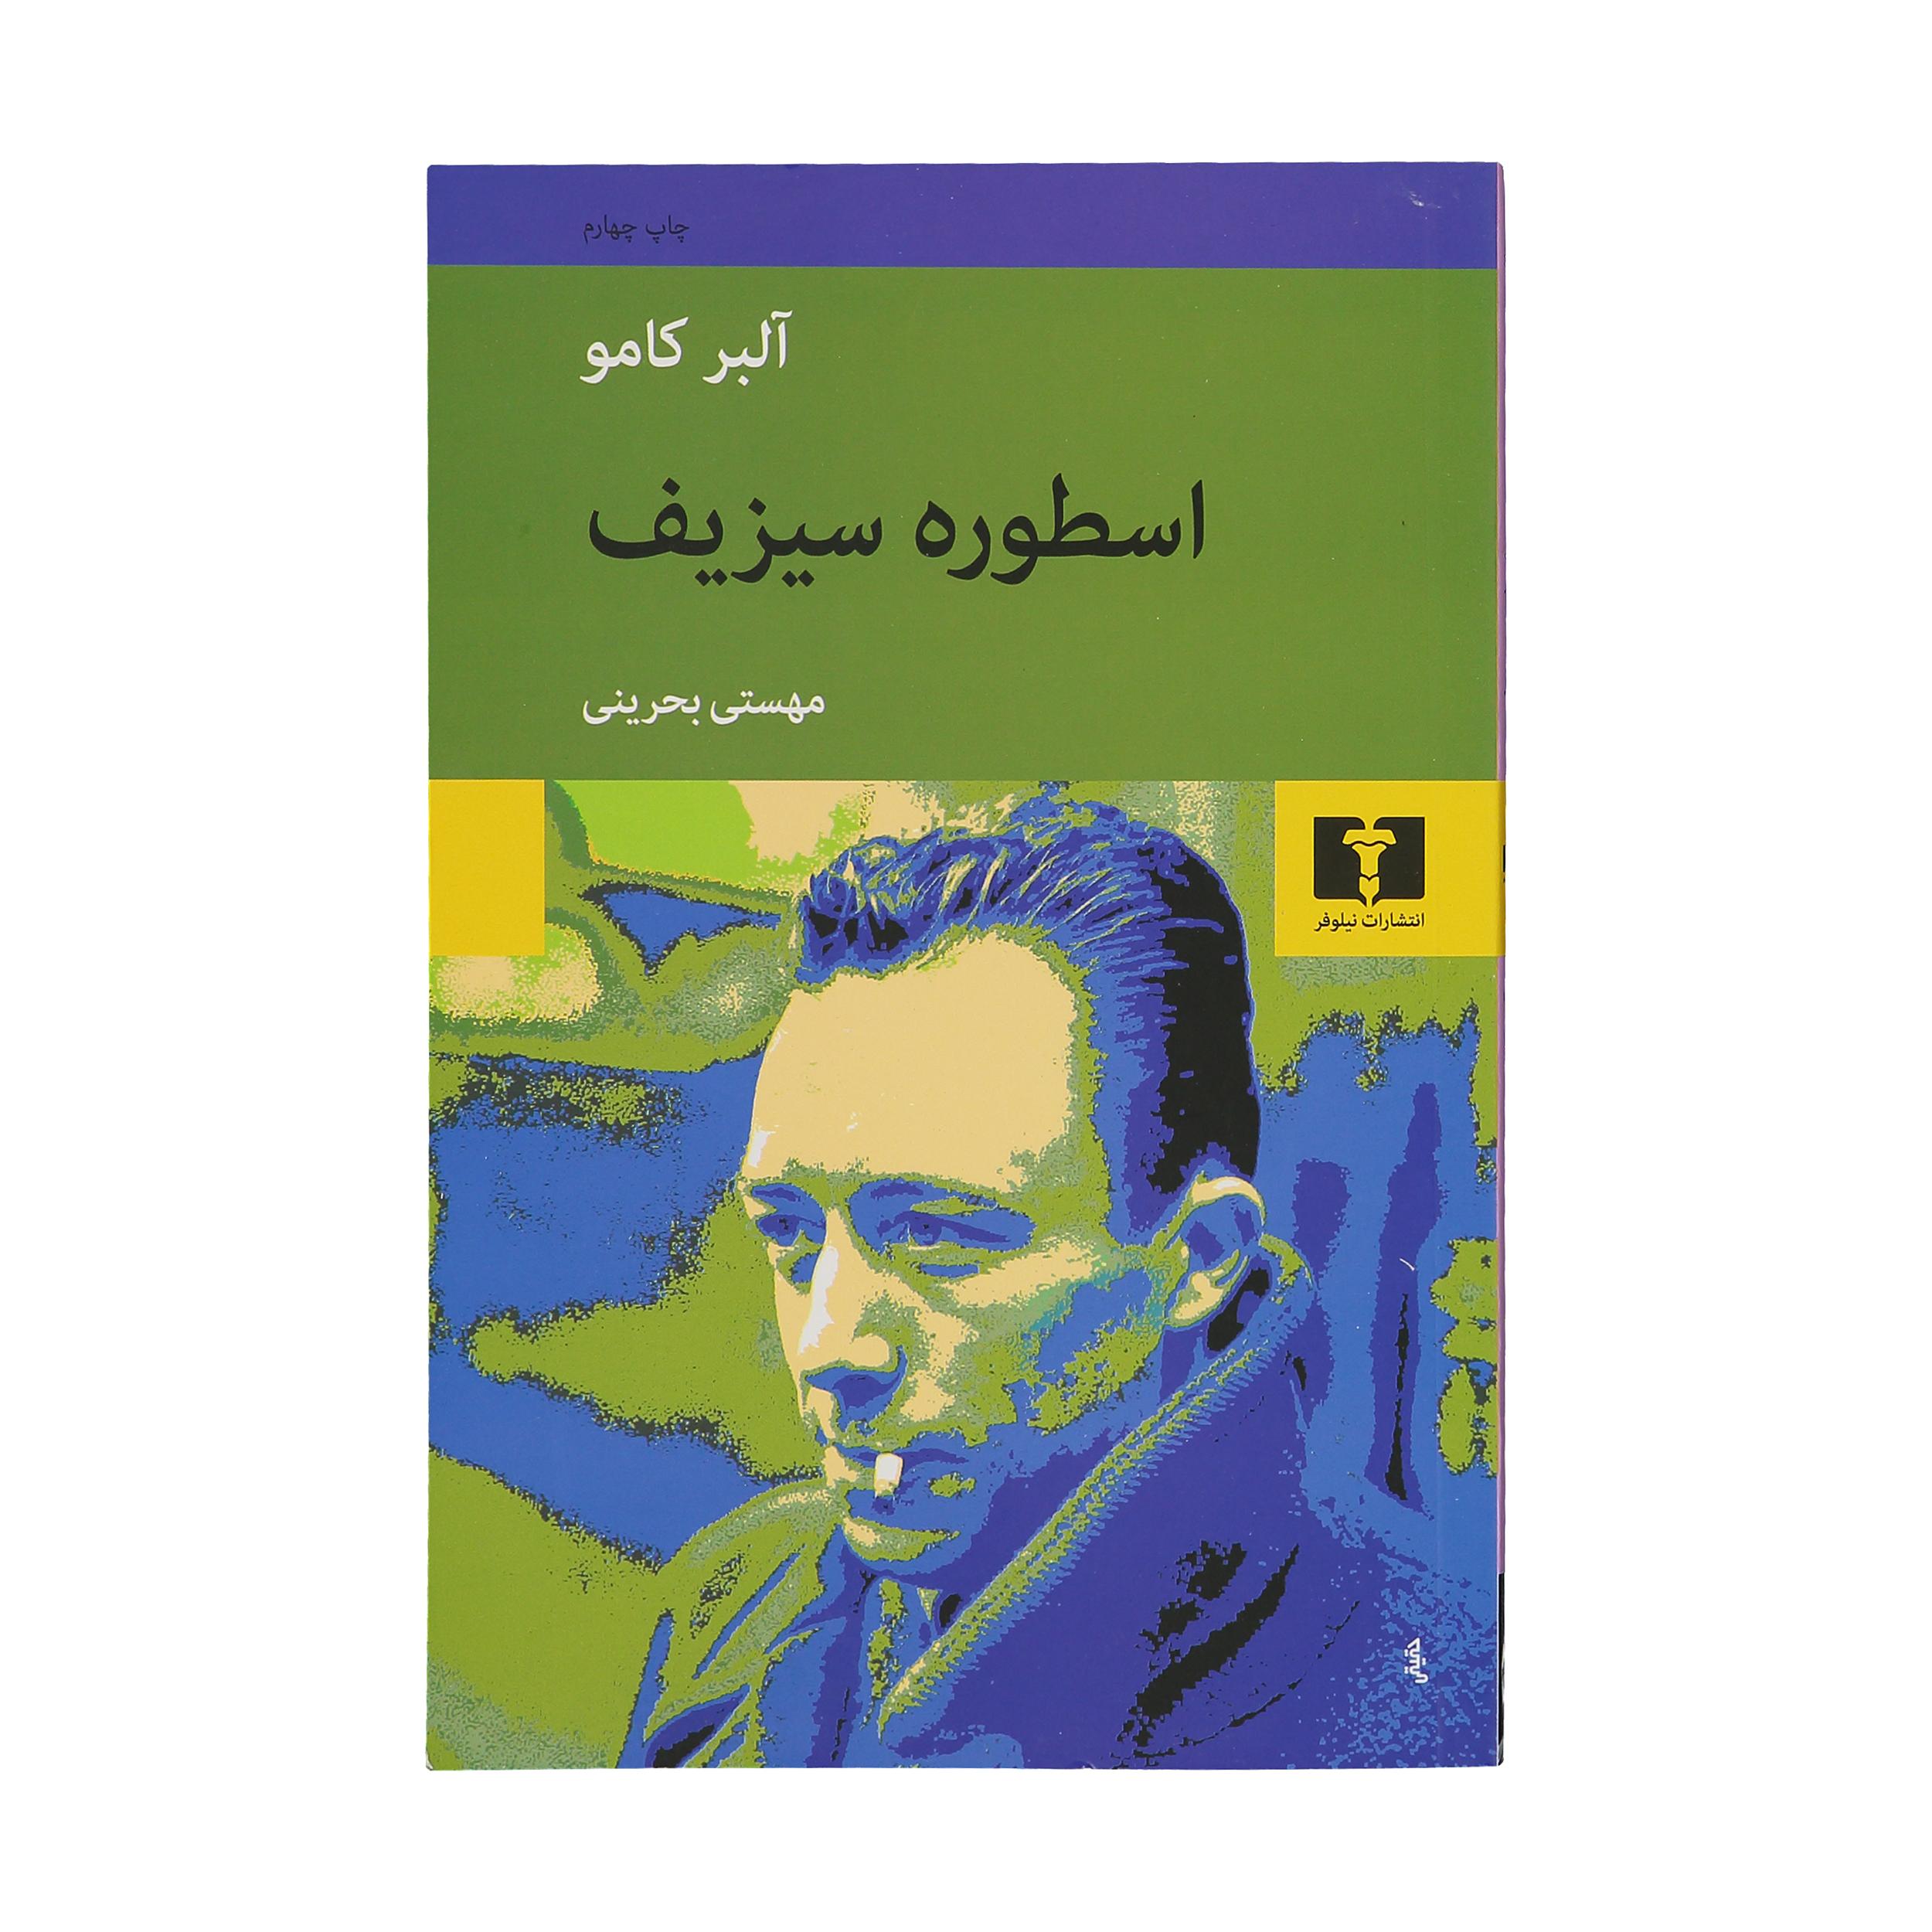 کتاب اسطوره سیزیف اثر آلبر کامو